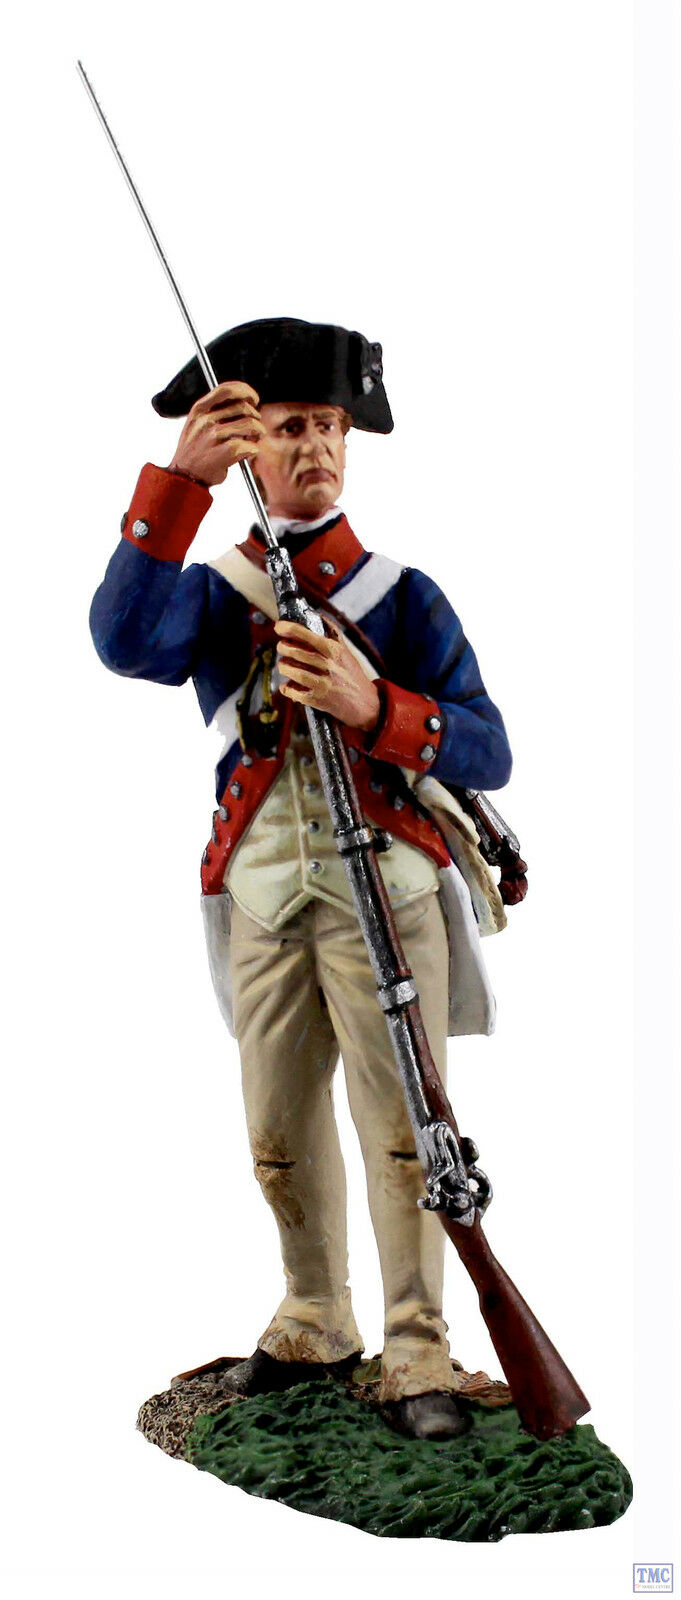 B16032 W.Britain Continental Army 1st American Regiment Standing Ramming